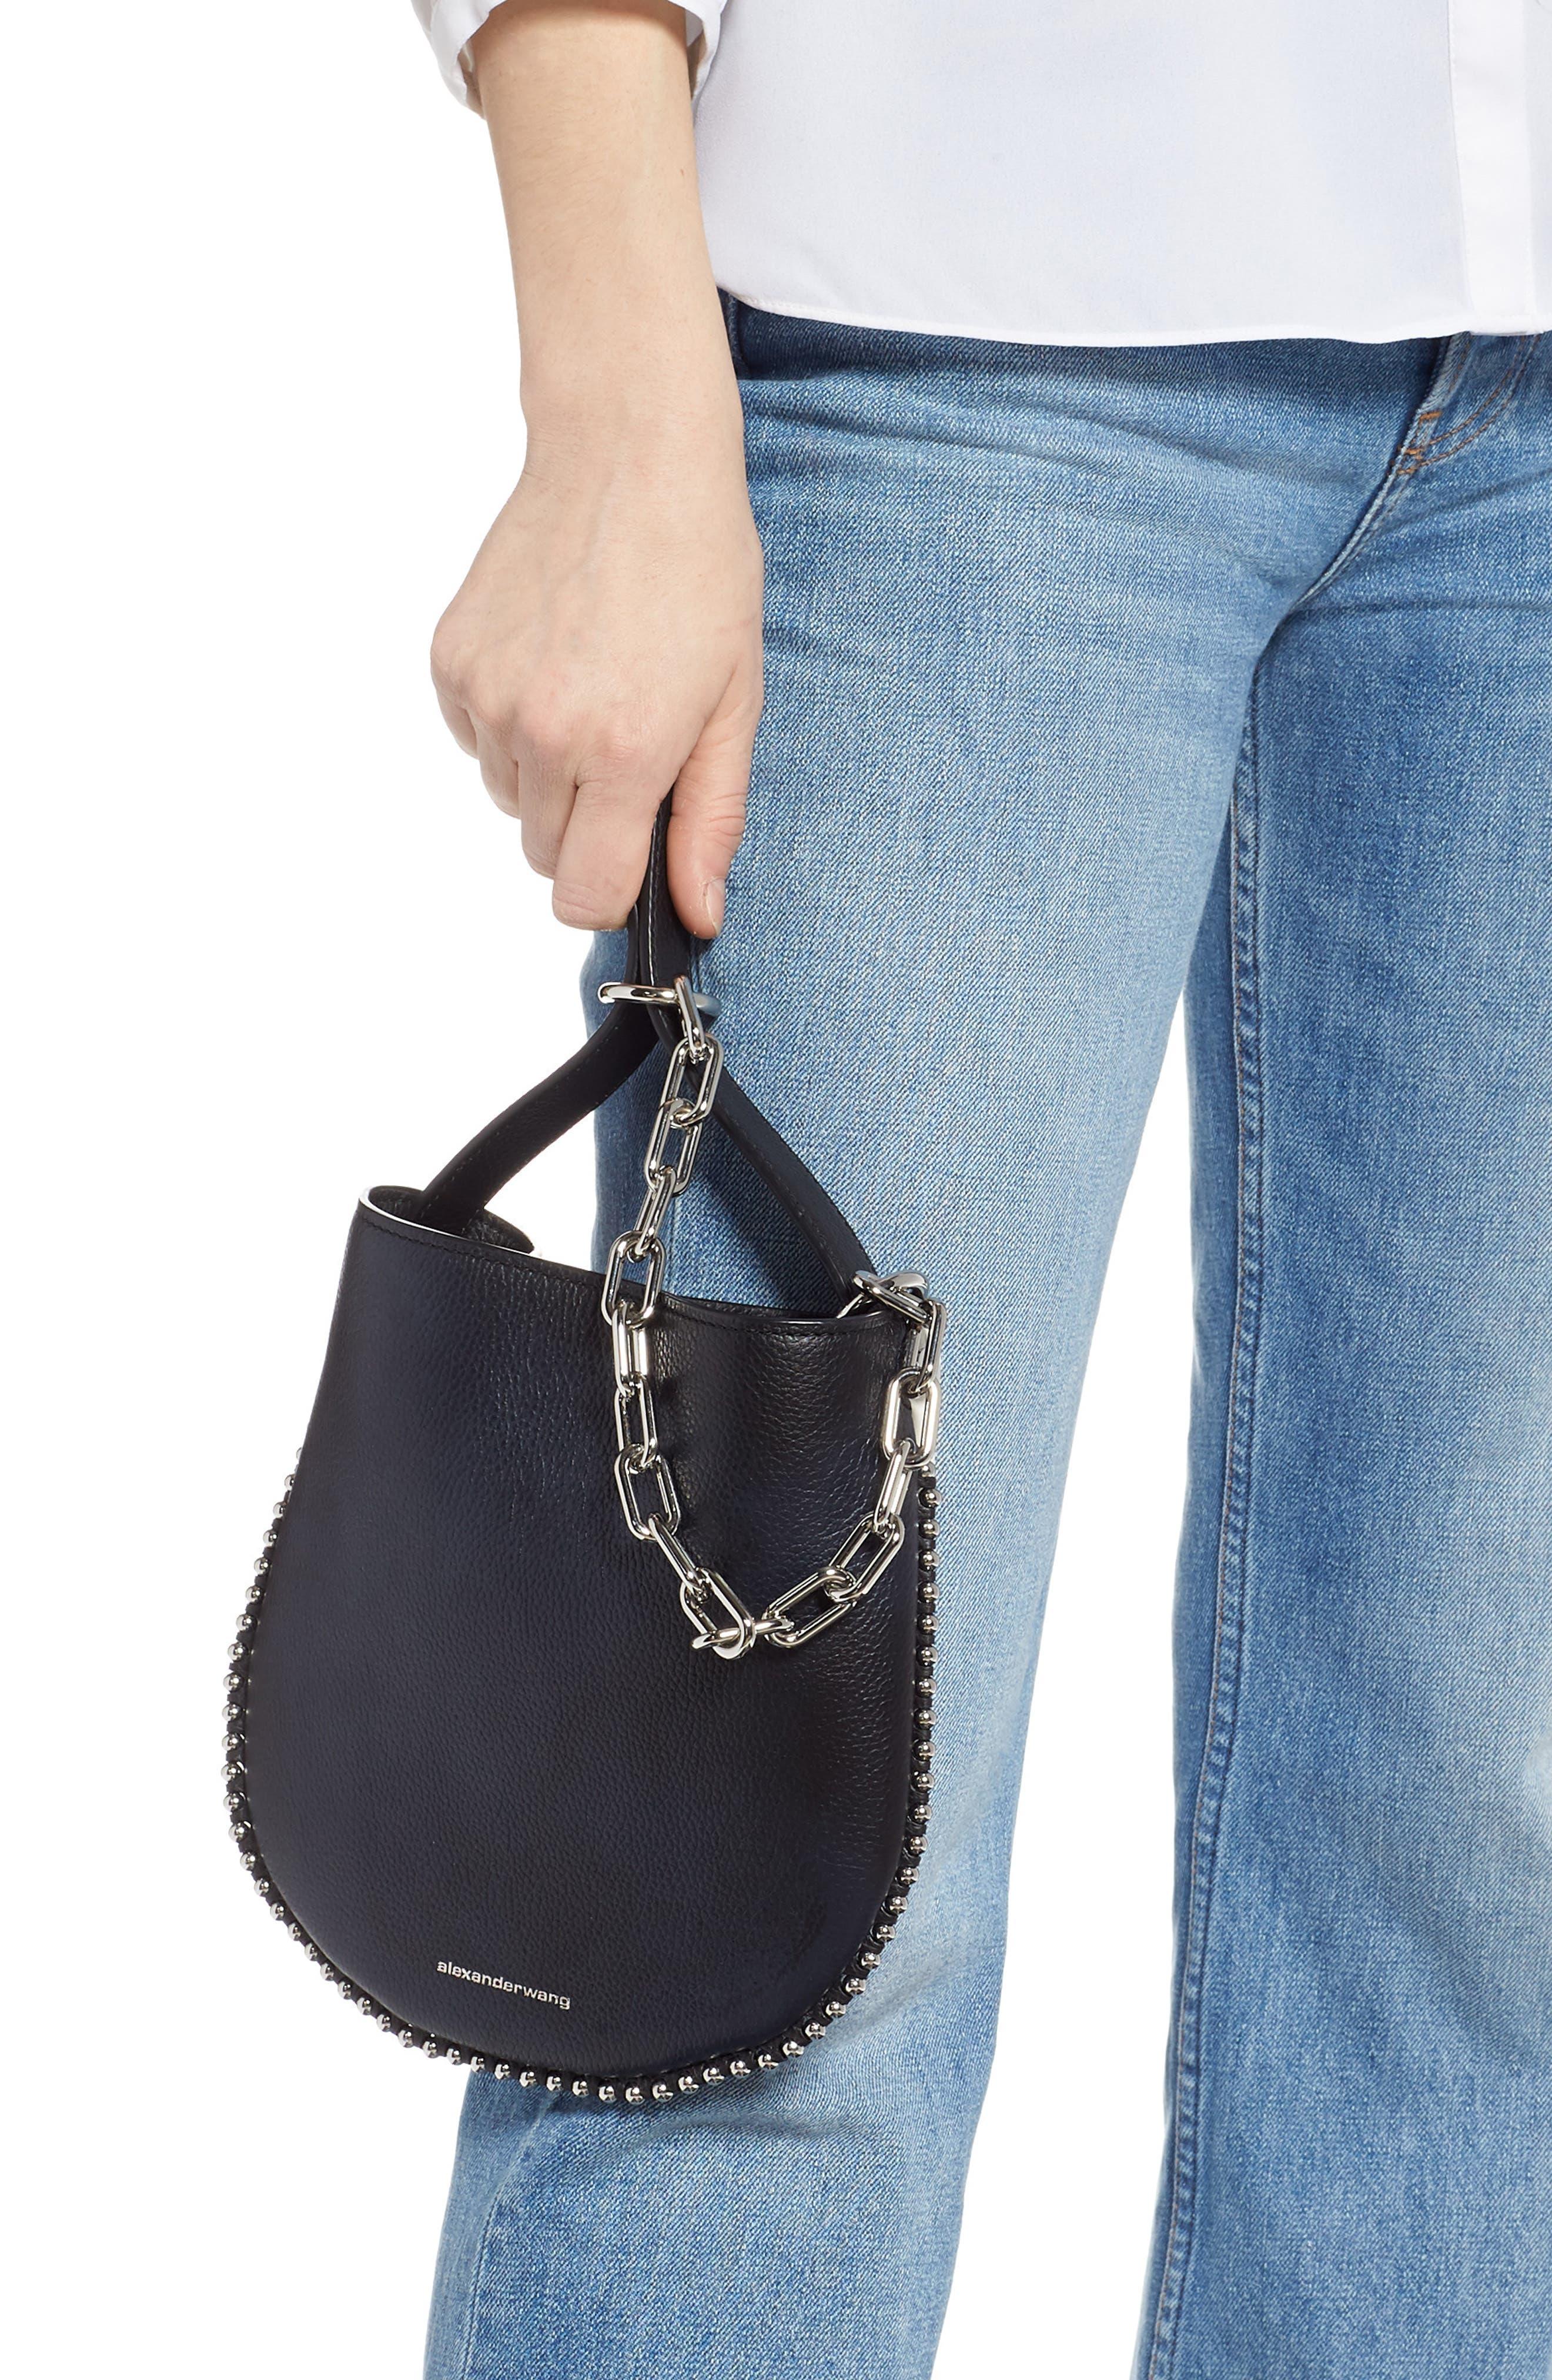 ALEXANDER WANG,                             Mini Roxy Leather Hobo Bag,                             Alternate thumbnail 3, color,                             BLACK/ WHITE